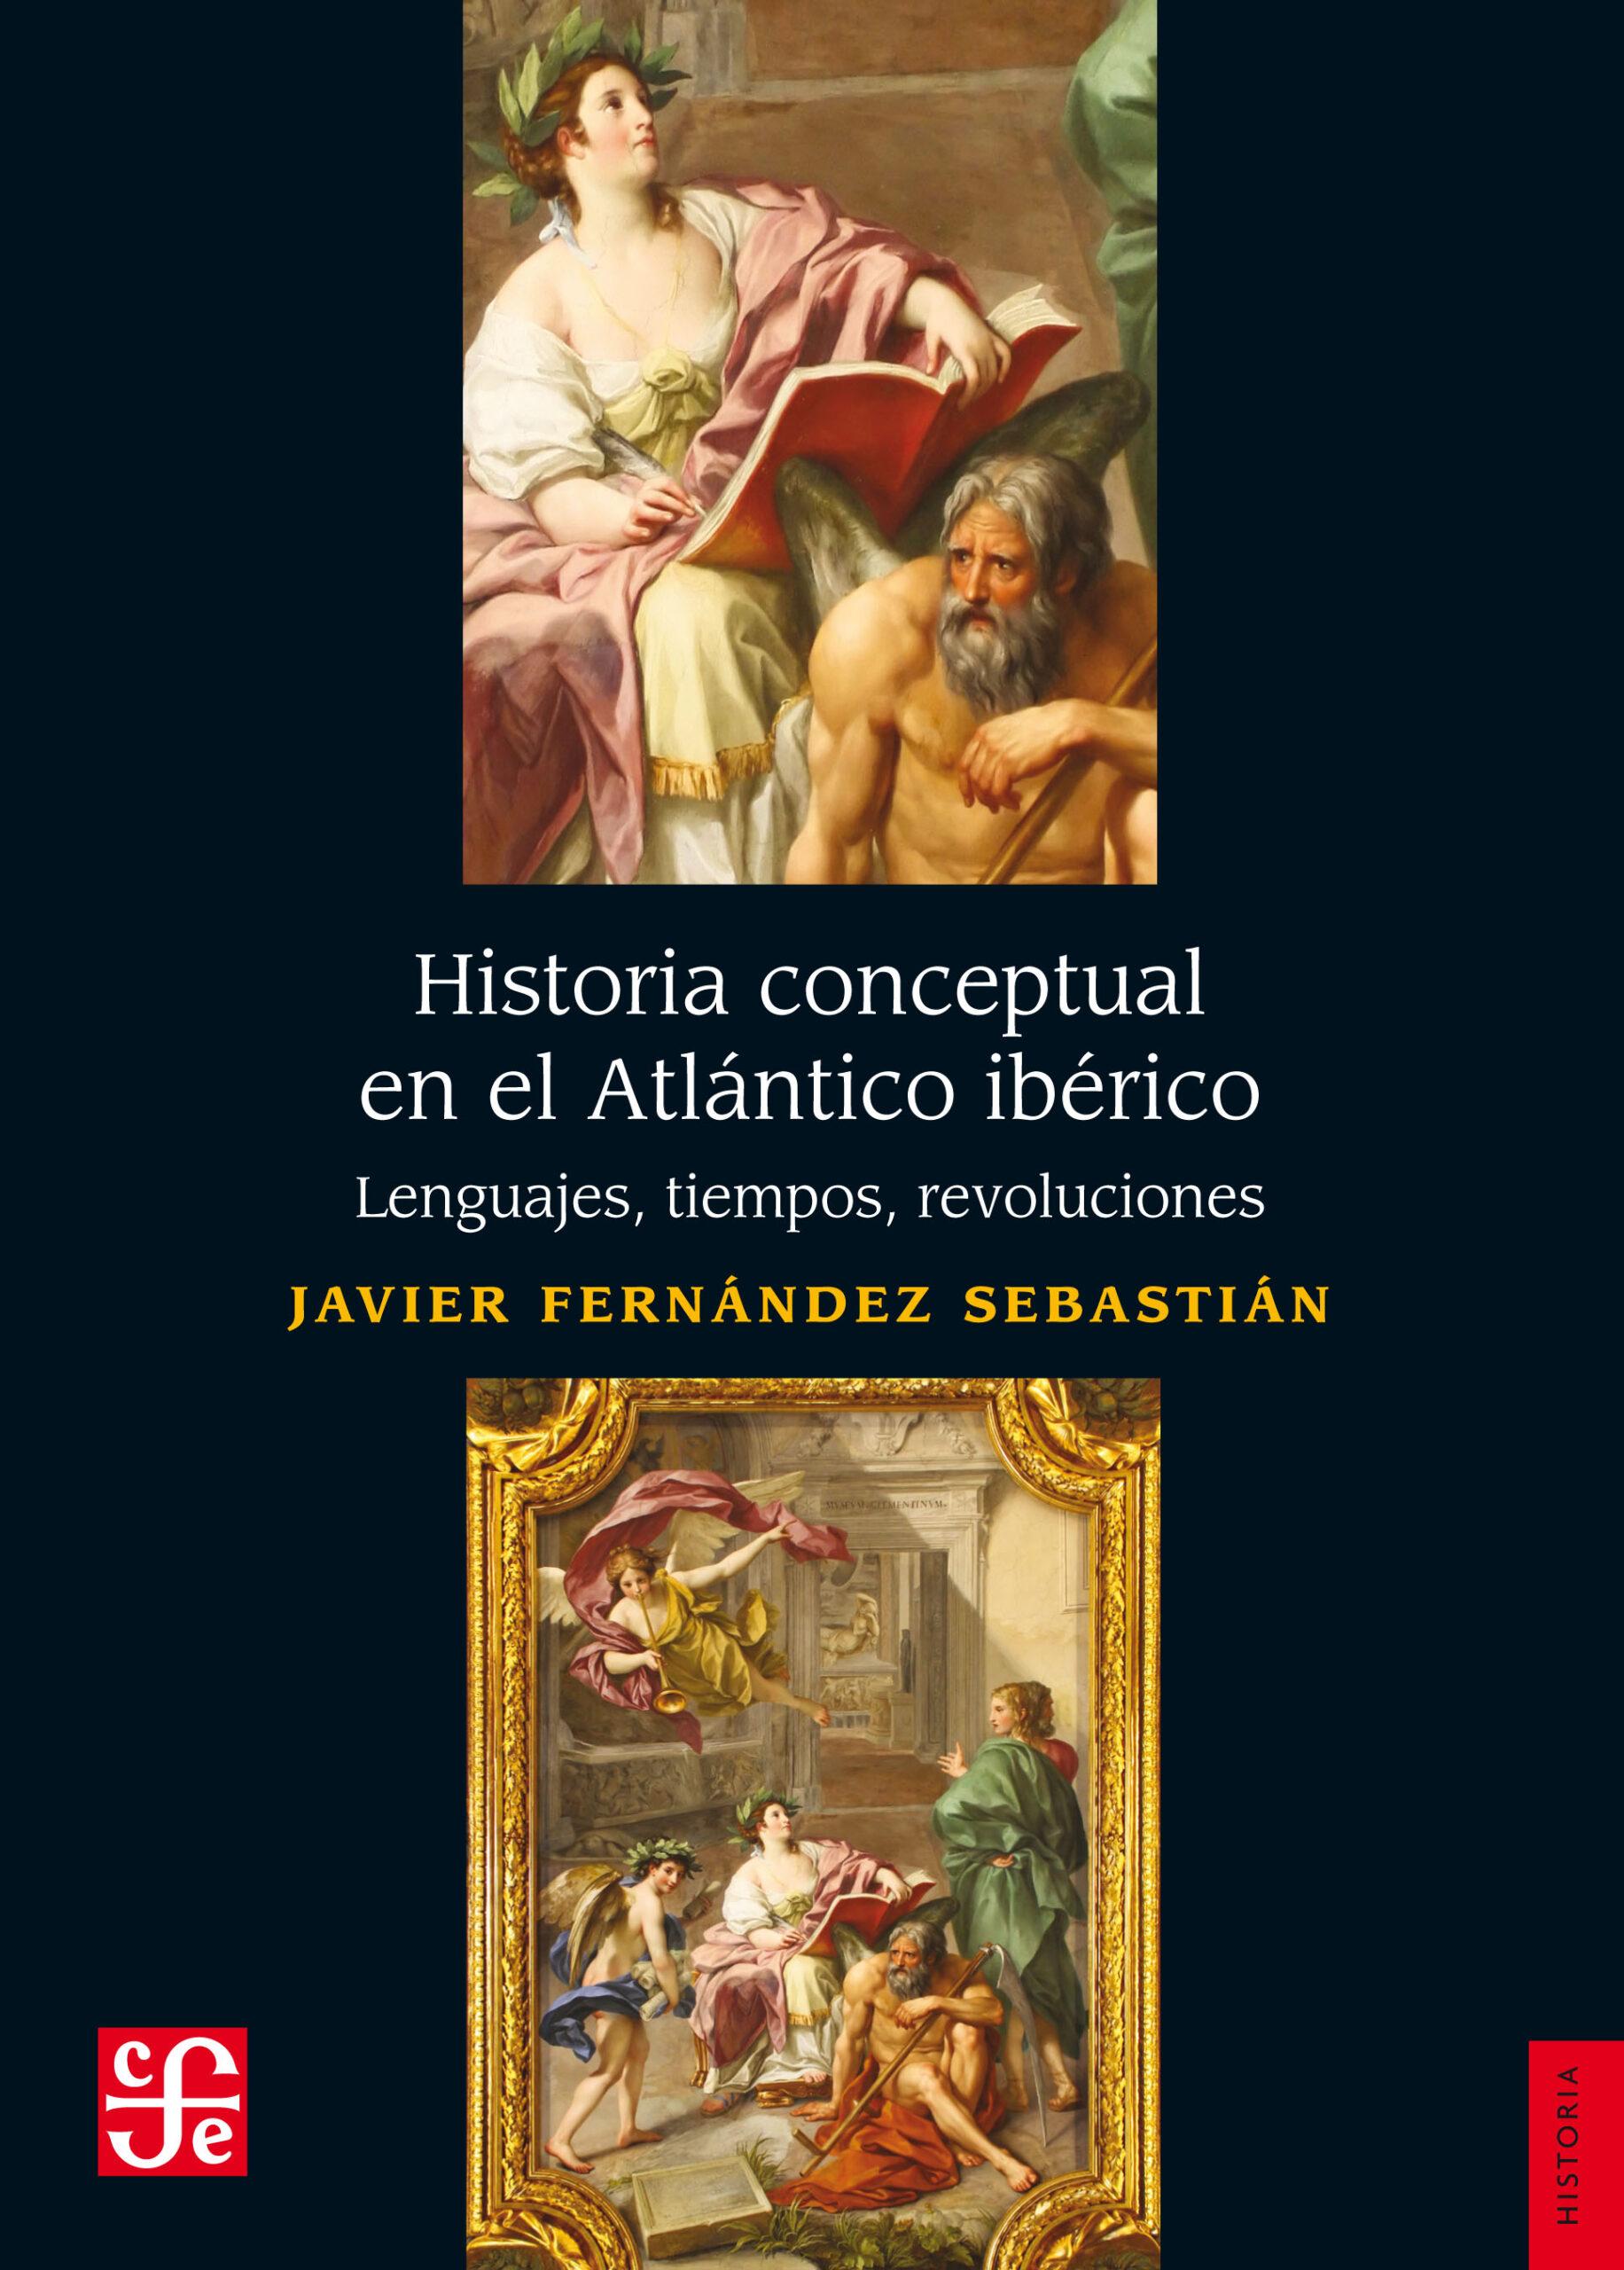 Historia conceptual